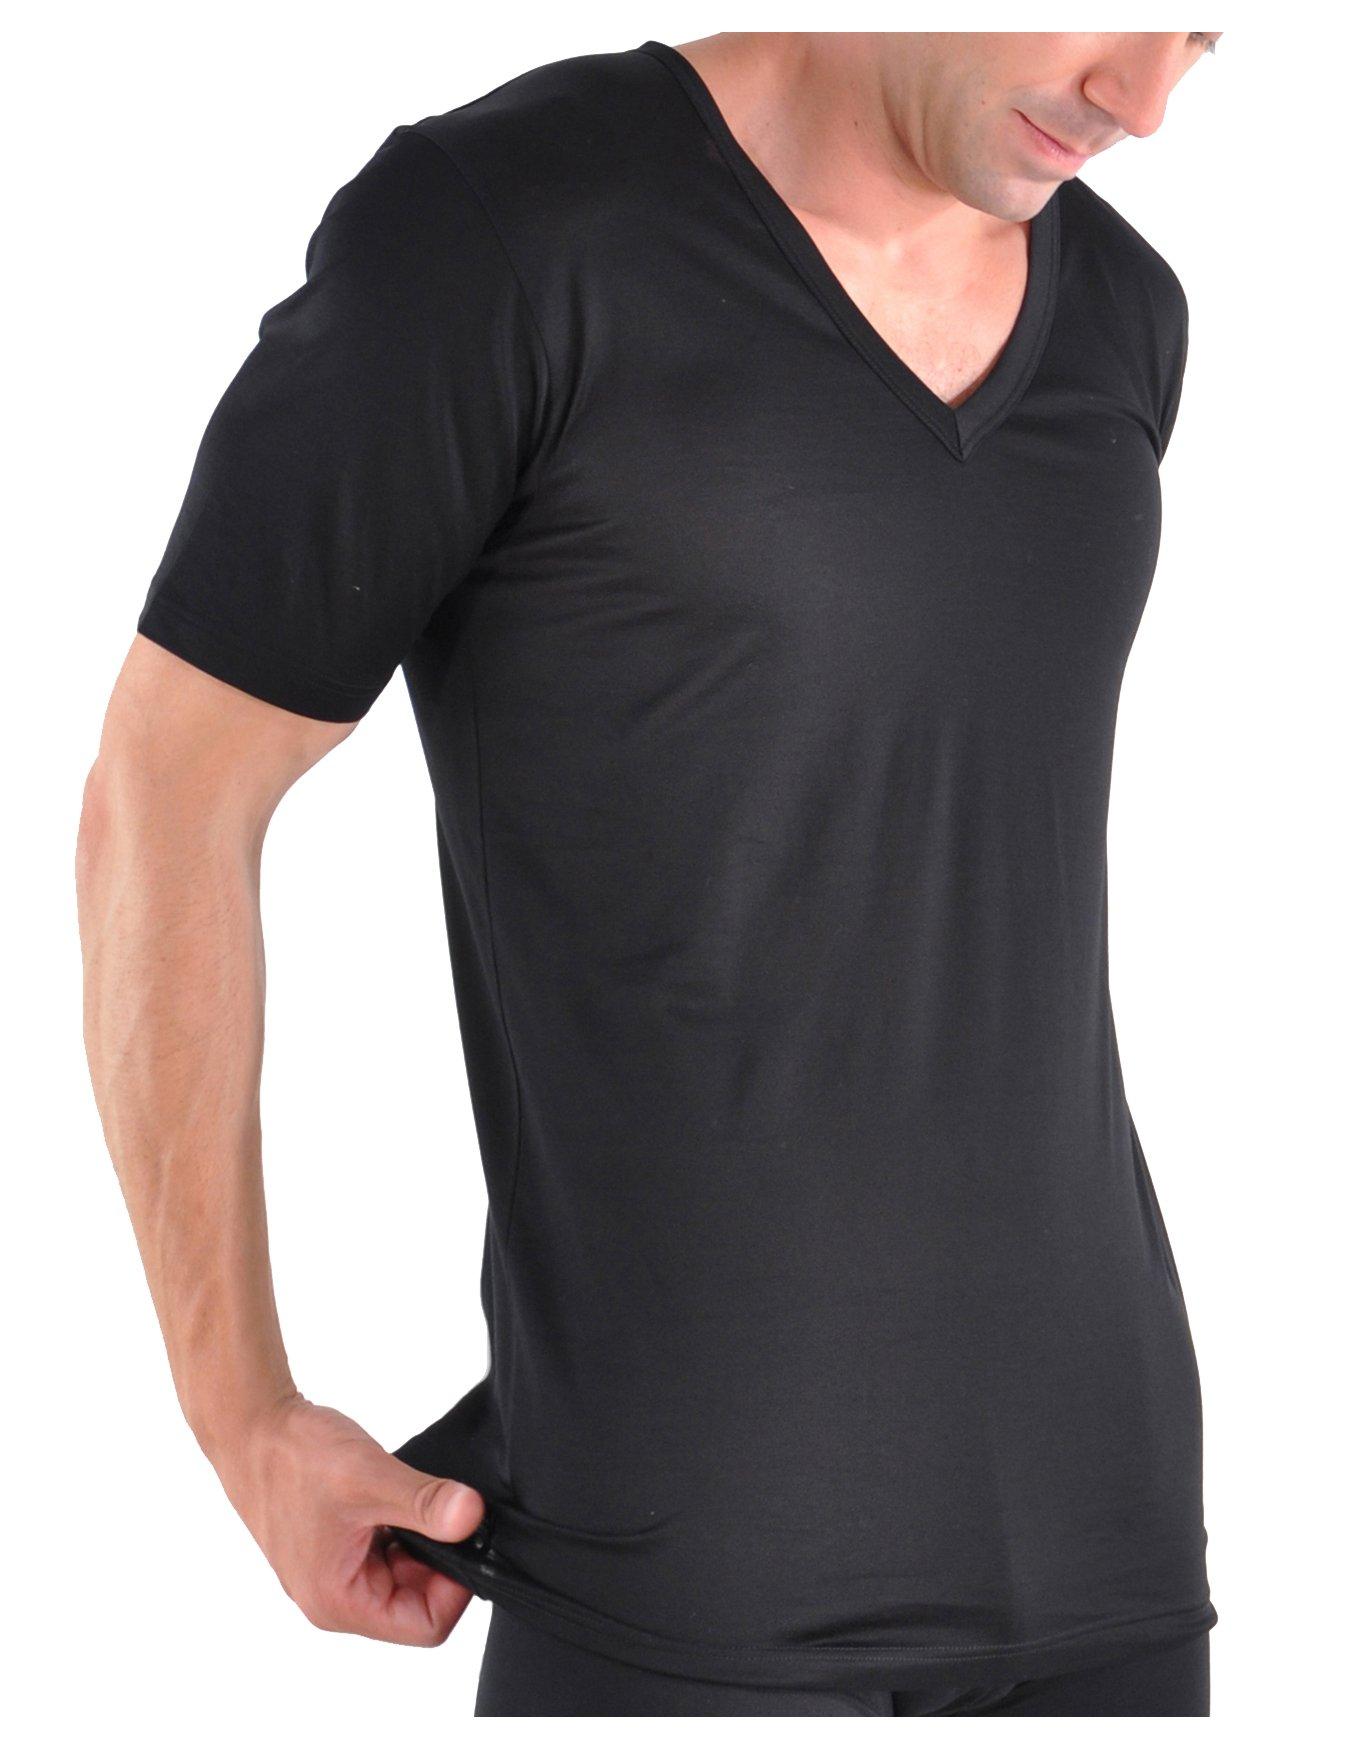 Bresciani Supremo Reale 2x2 Egyptian Cotton Italian-Made V-neck Undershirt Large/Black